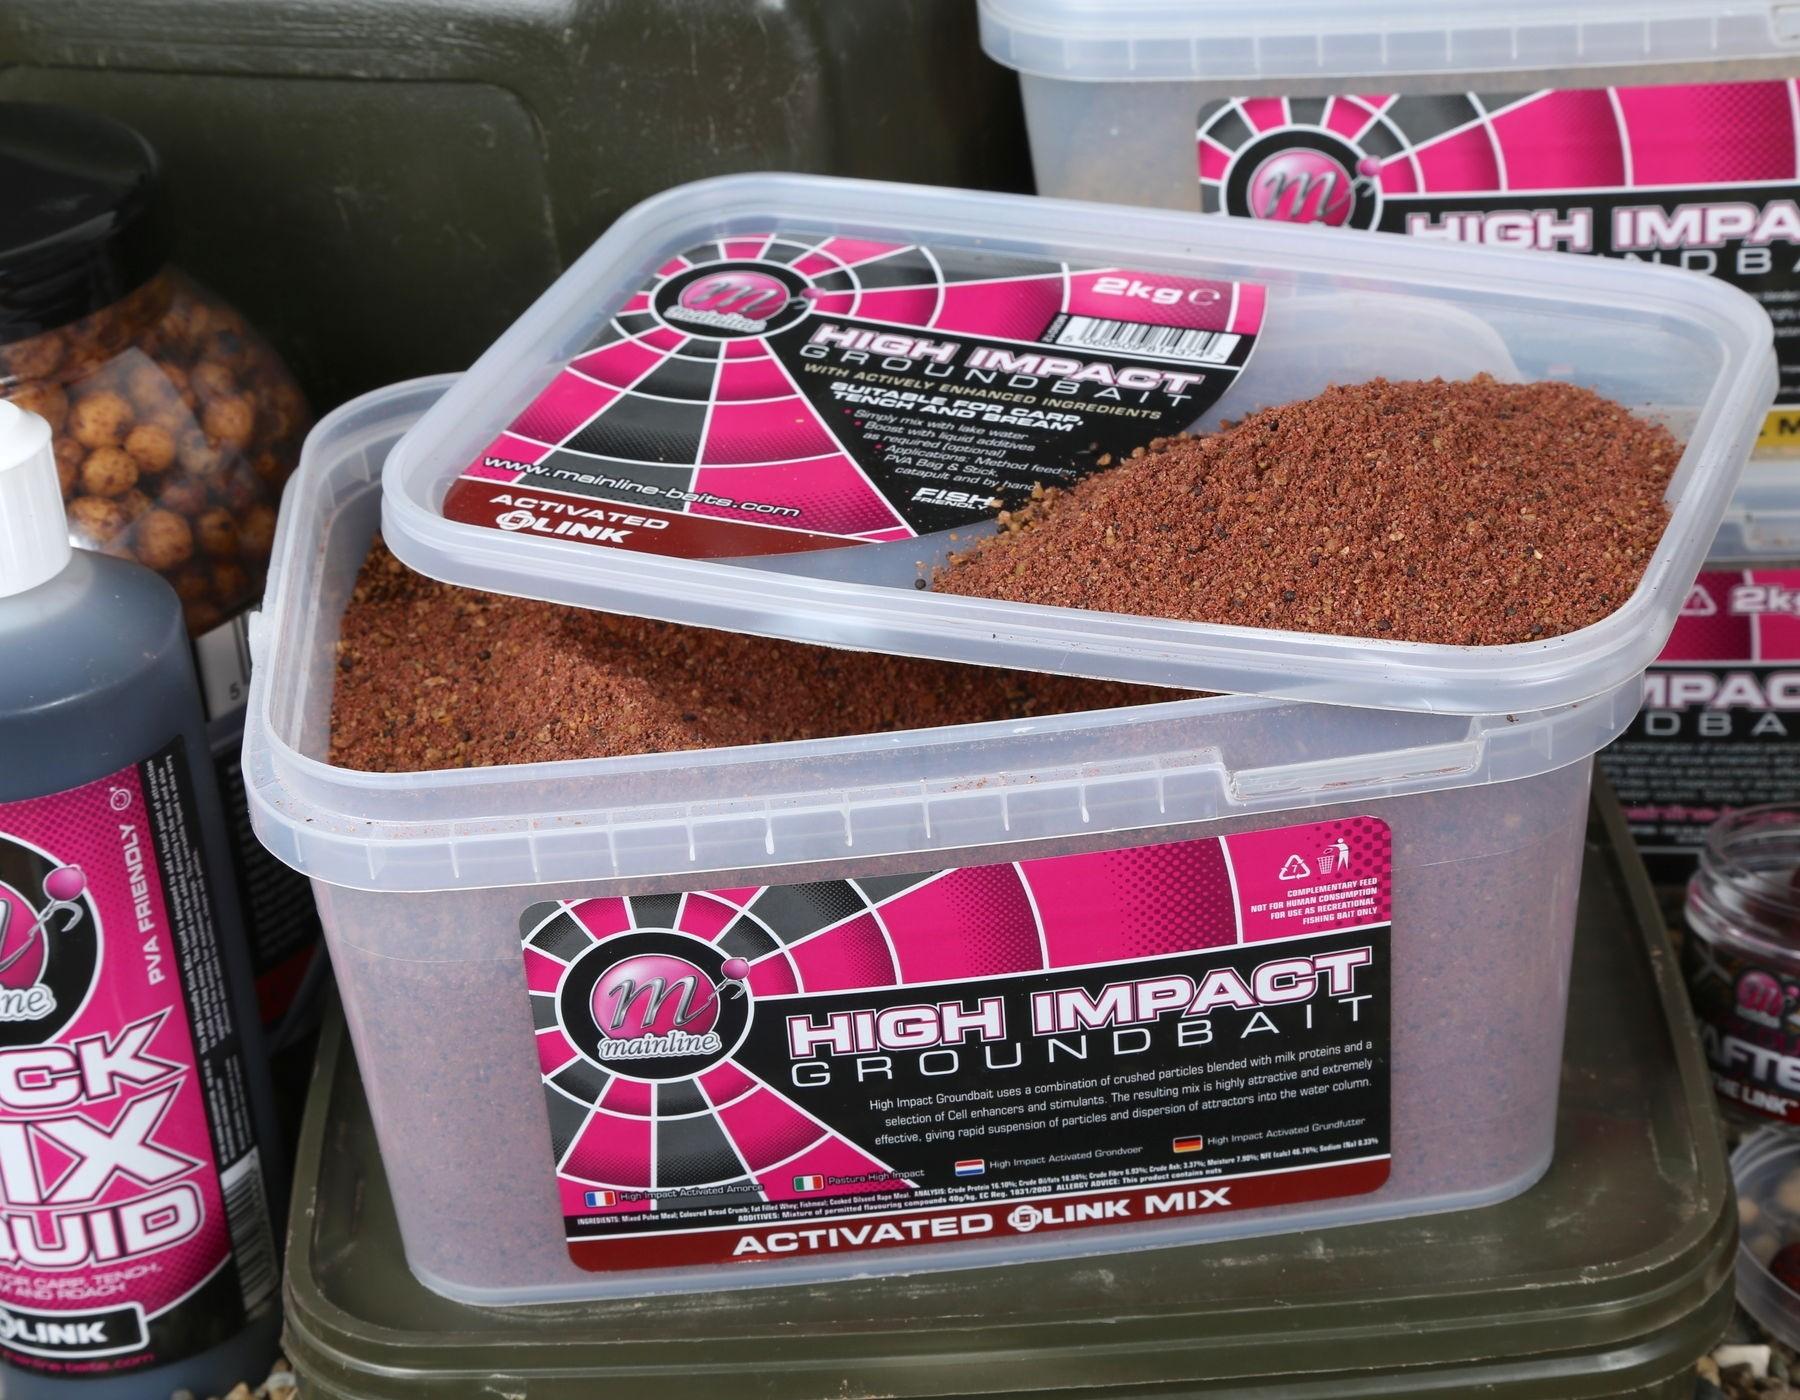 2KG BUCKET OF MAINLINE SPOD /& PELLET MIX HI IMPACT GROUNDBAIT FOR CARP FISHING